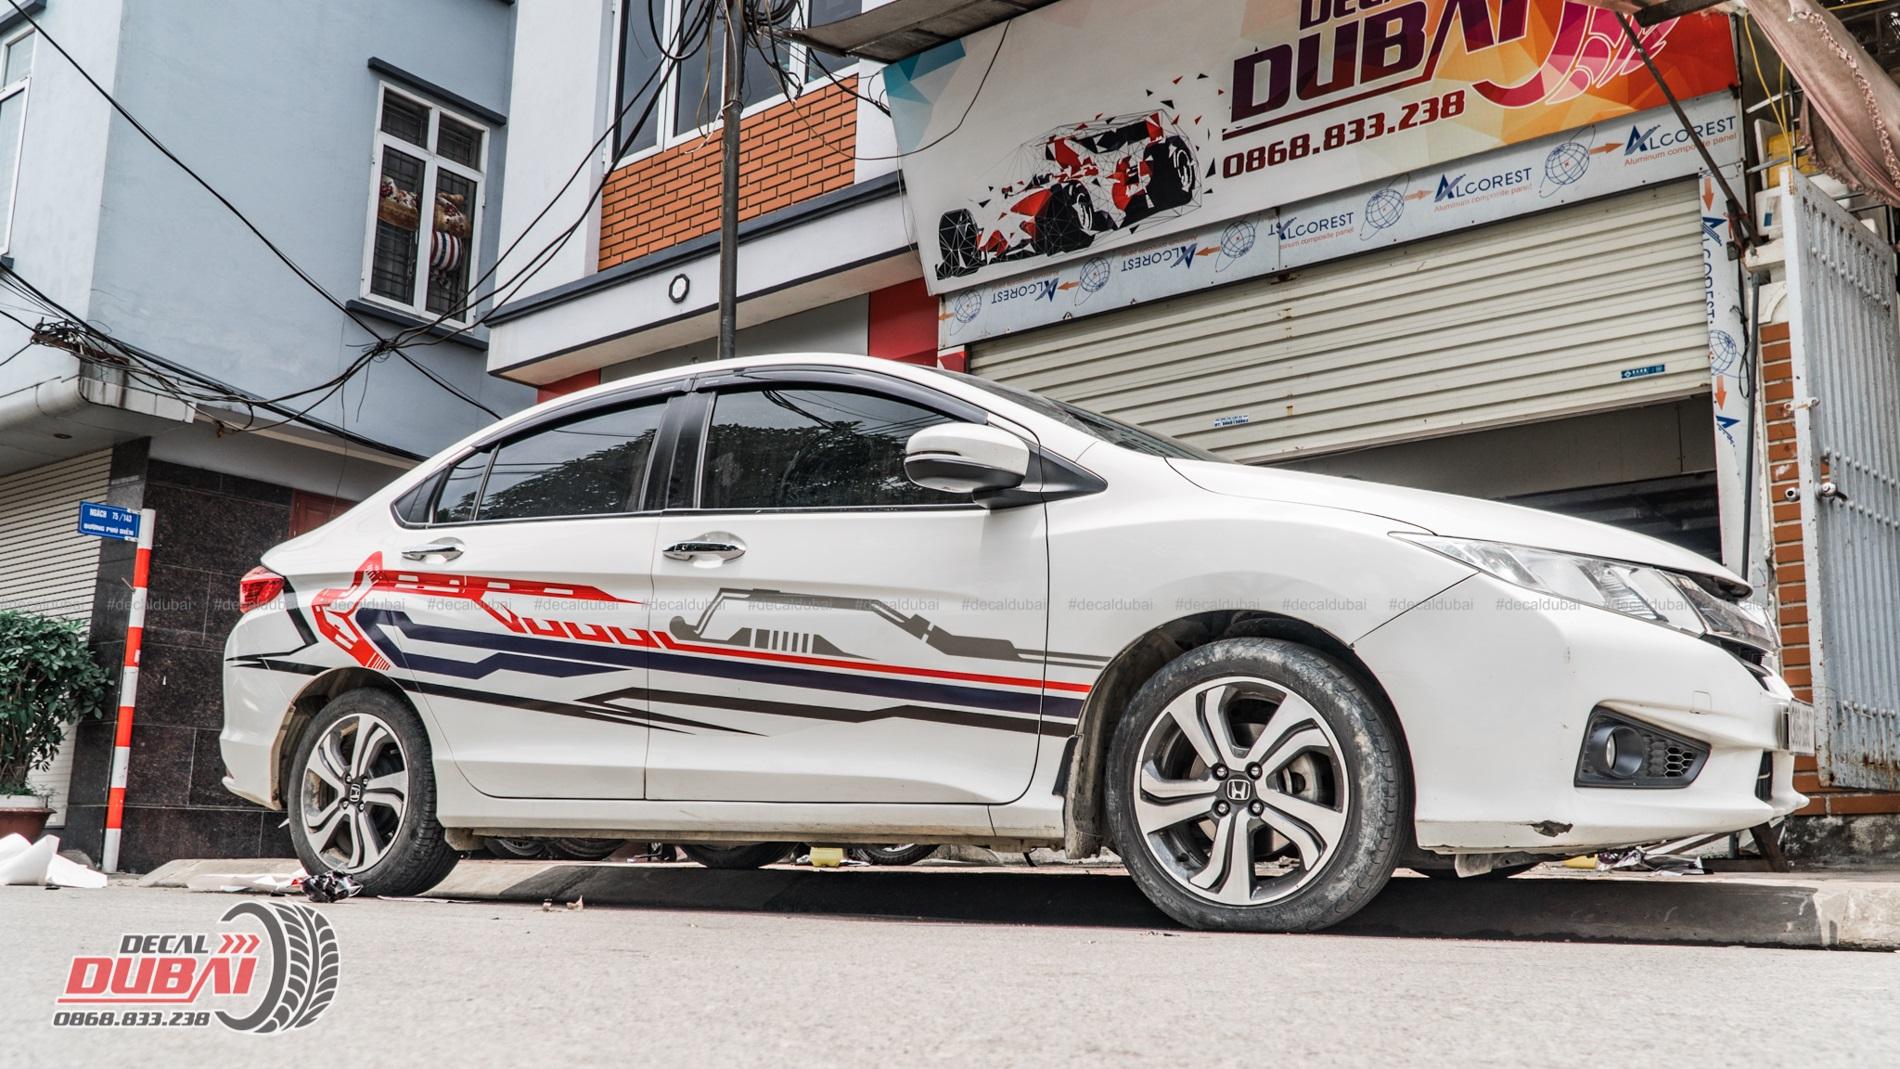 Tem-Xe-Honda-City-0002-750k